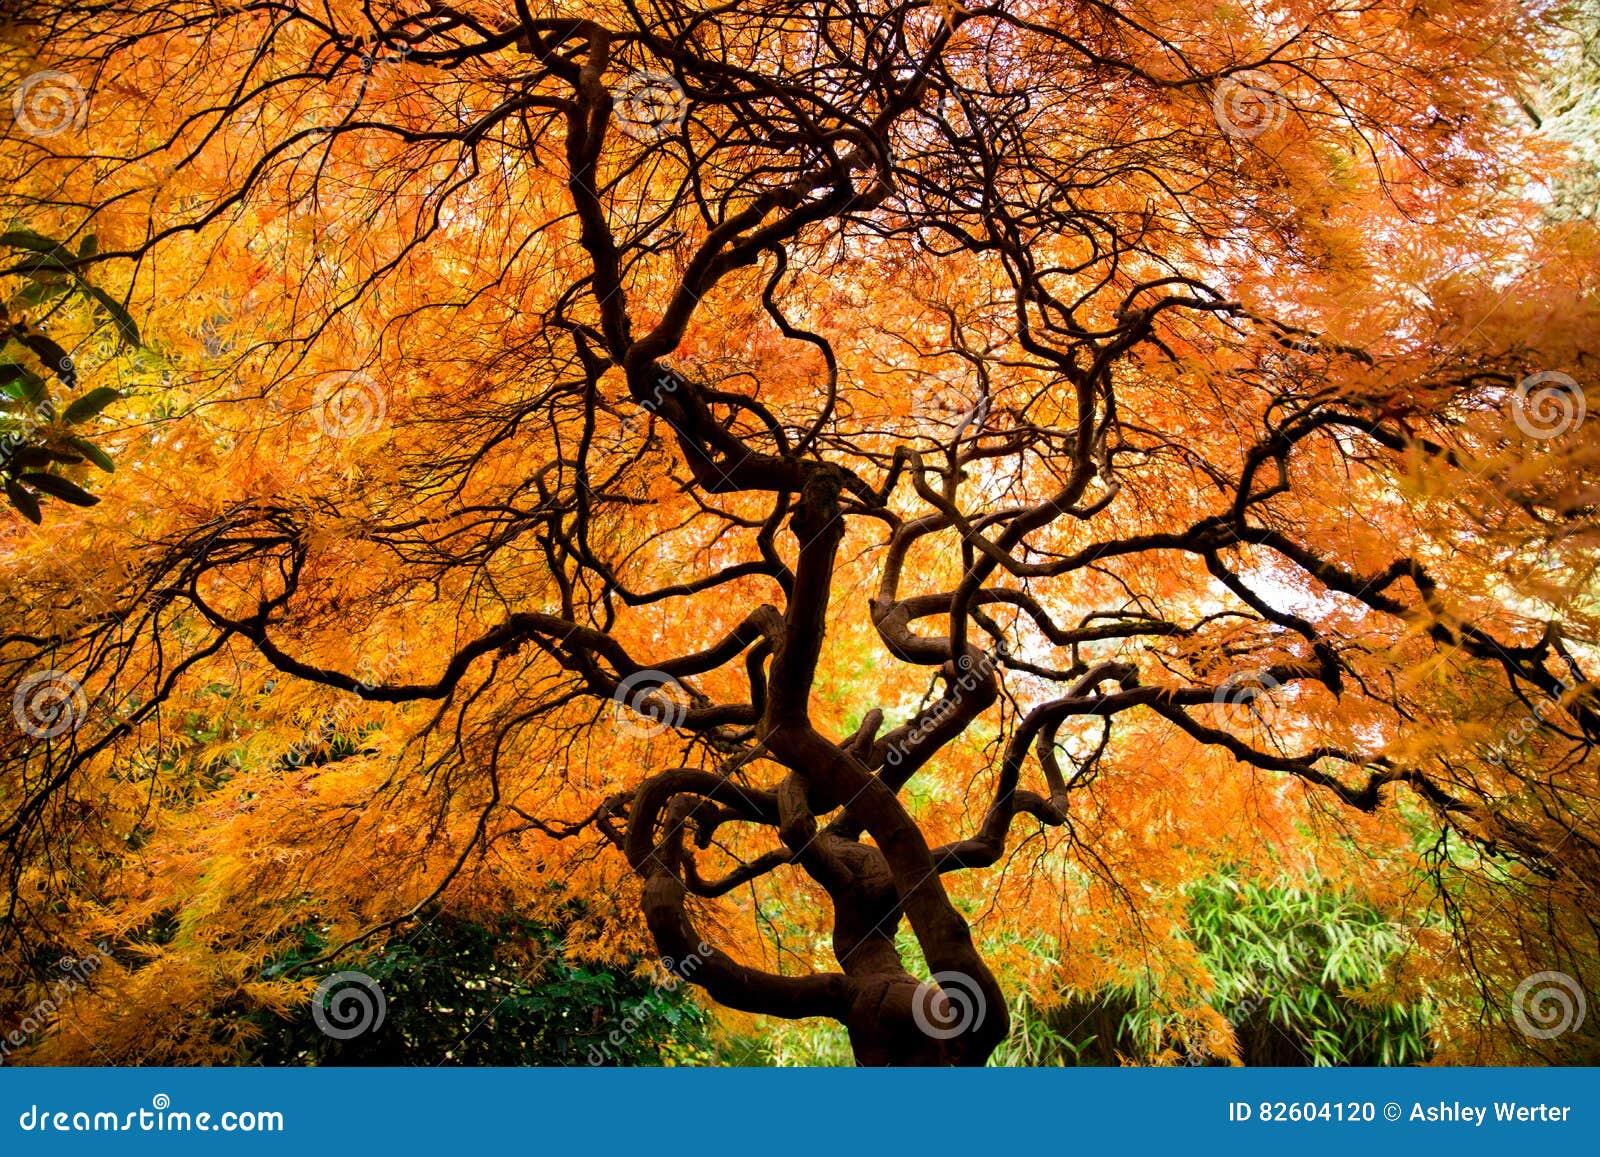 Kubota Garden stock photo. Image of maple, green, branch - 82604120